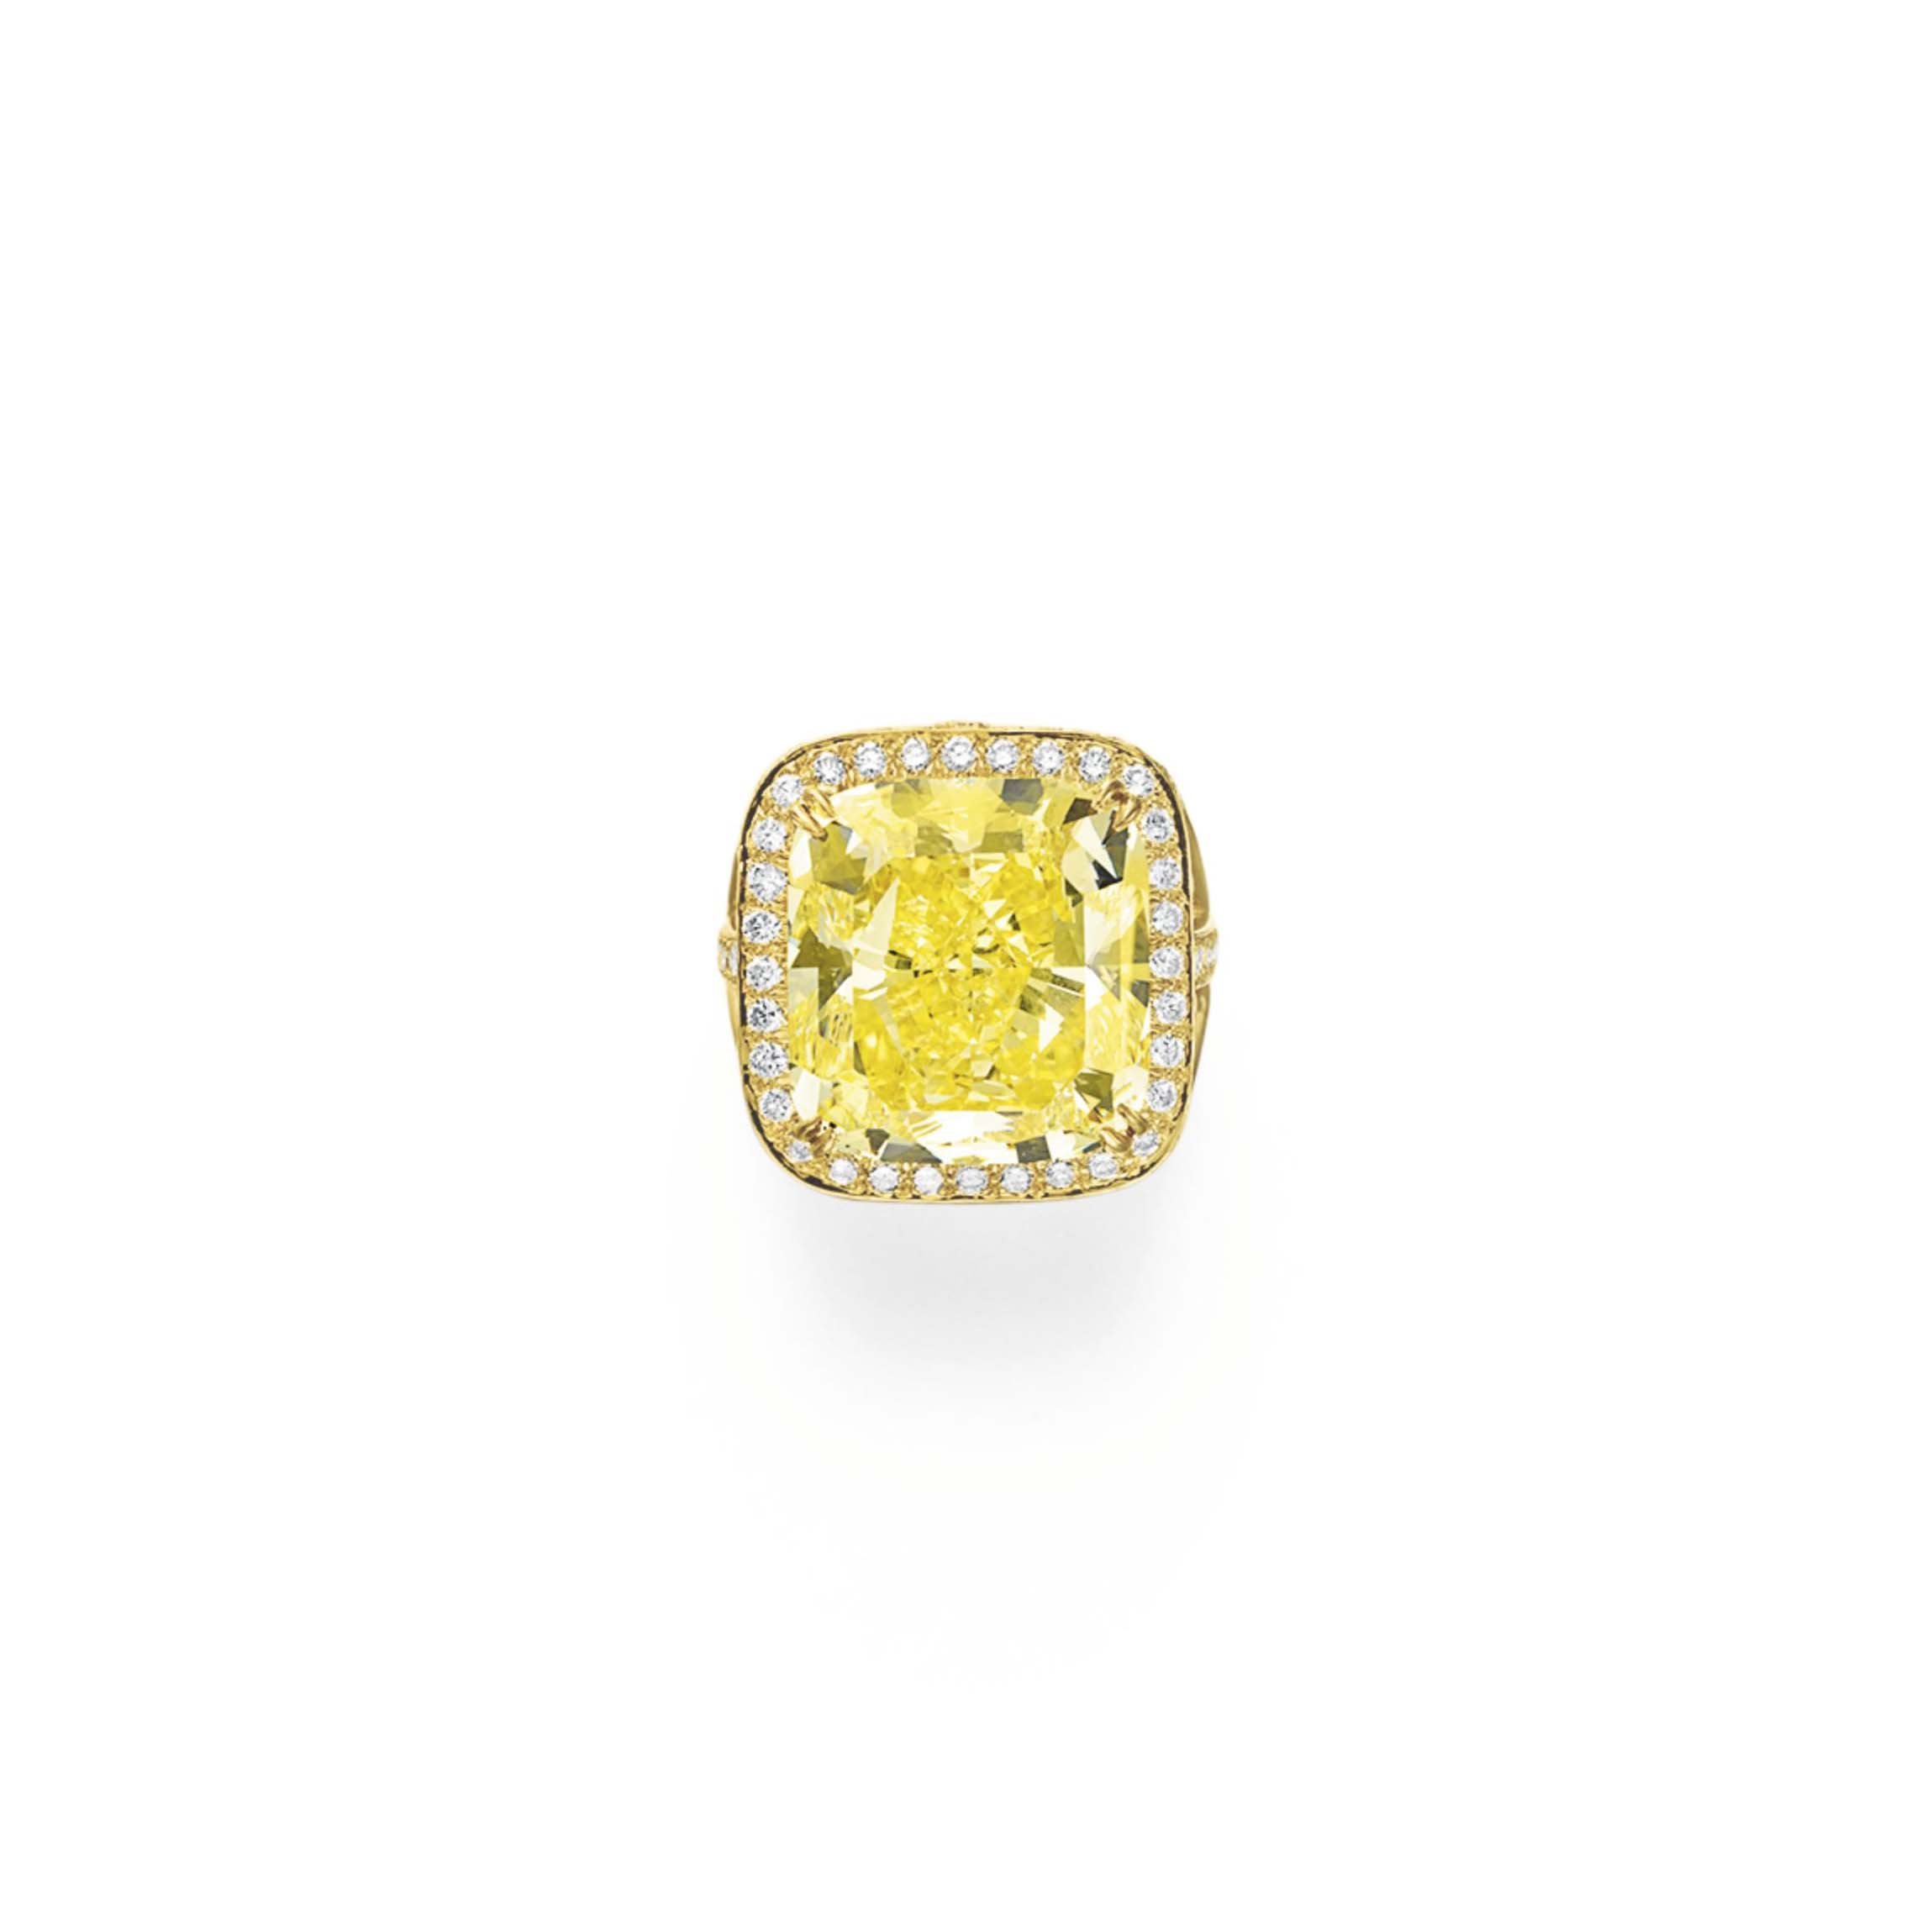 A COLORED DIAMOND RING, BY DAVID WEBB